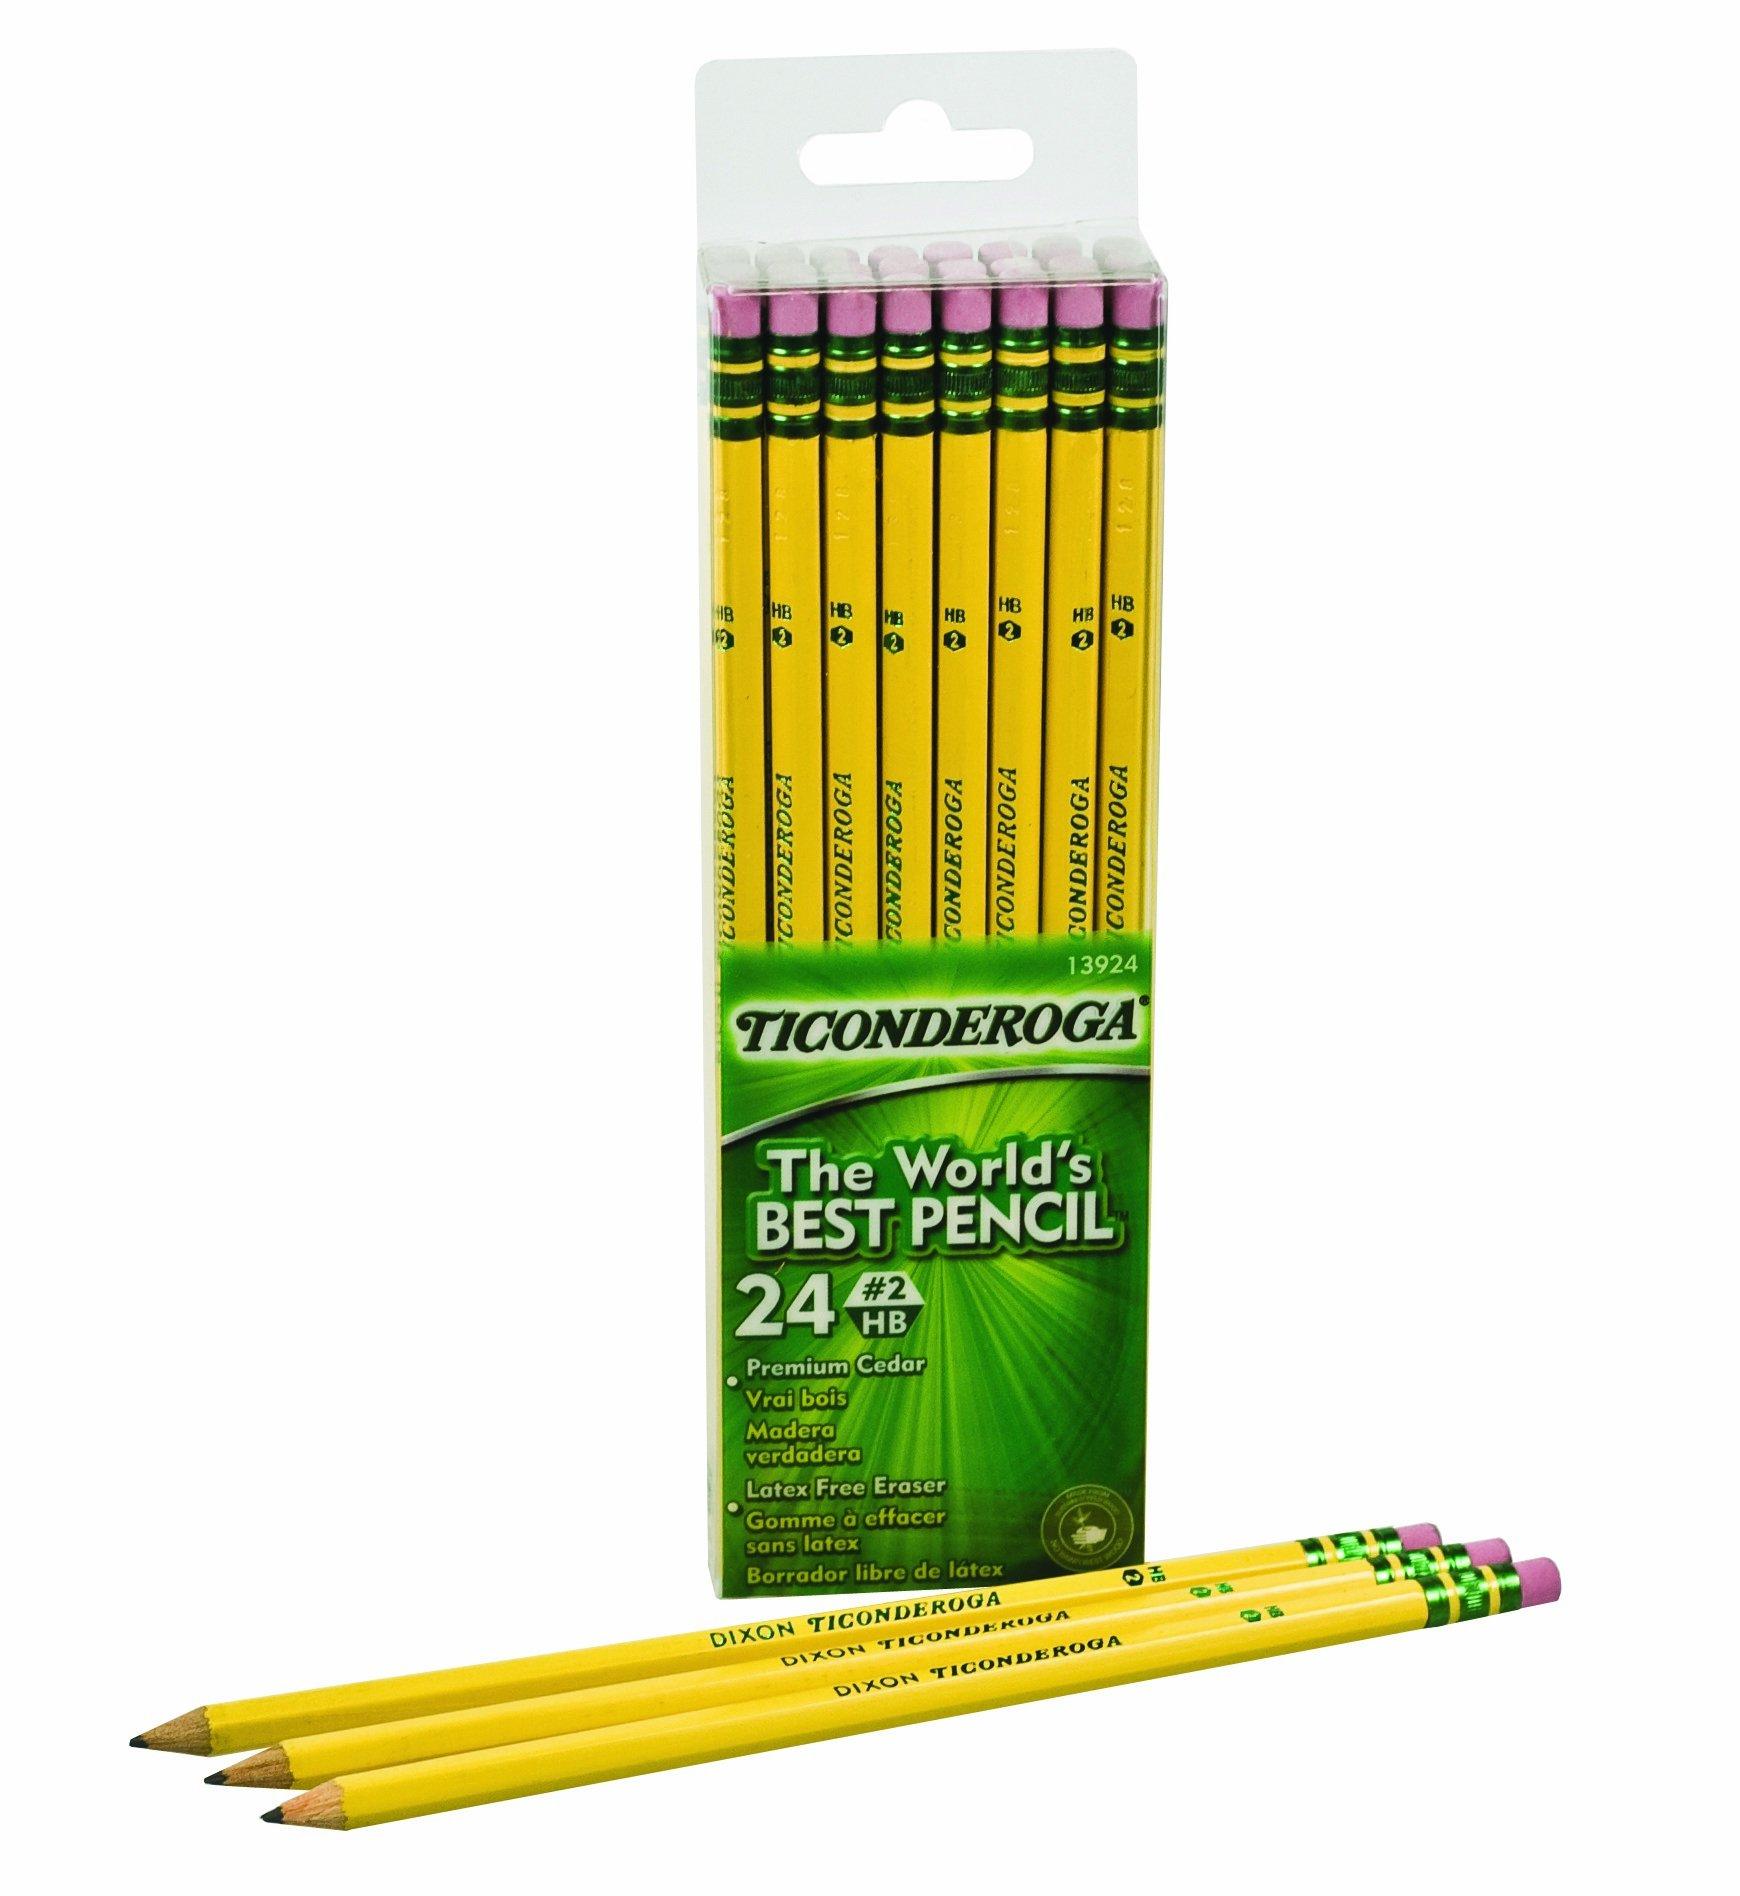 Dixon Ticonderoga Wood-Cased #2 HB Pencils, Six 24-Count Hang-Tab Boxes, Total 144 Pencils, Yellow (13924) (13924N) by Dixon (Image #3)